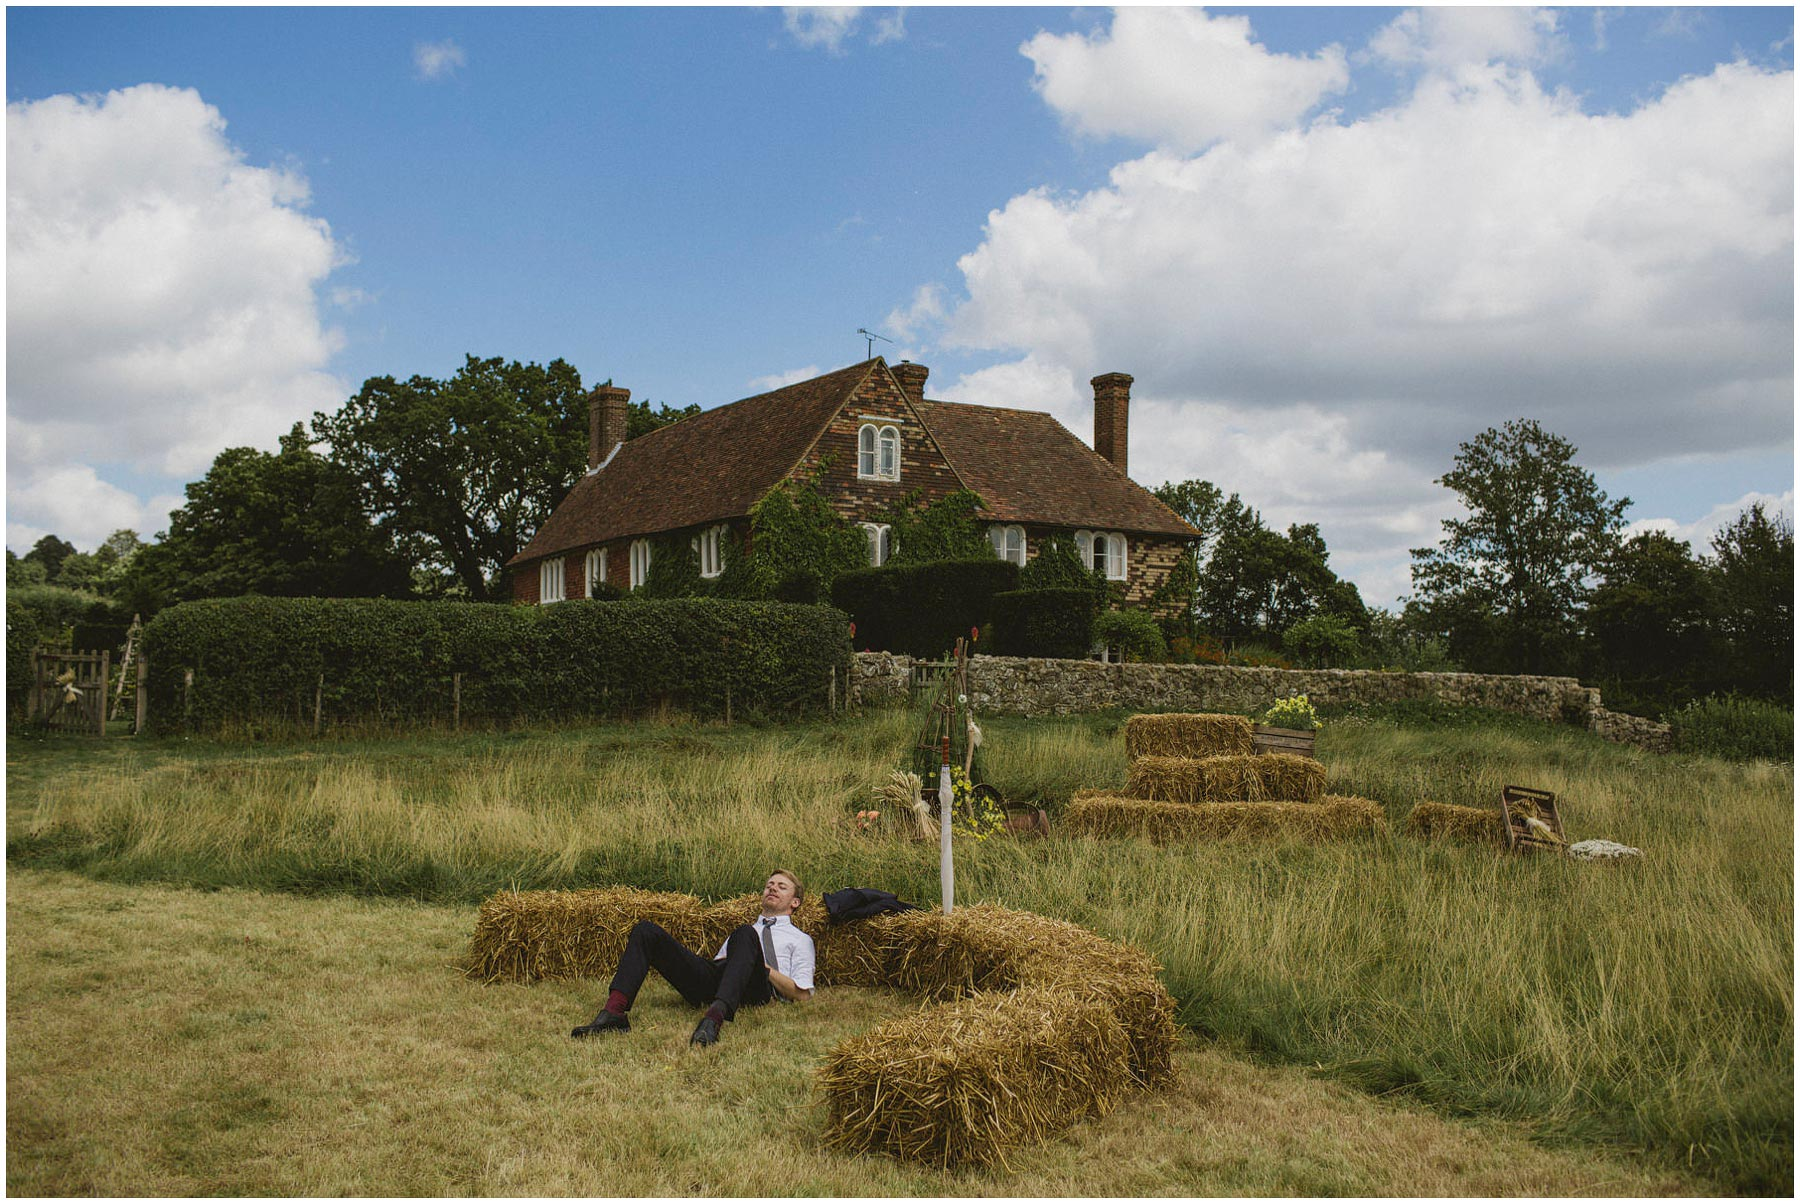 Kent-Festival-Tipi-wedding-photography_0021